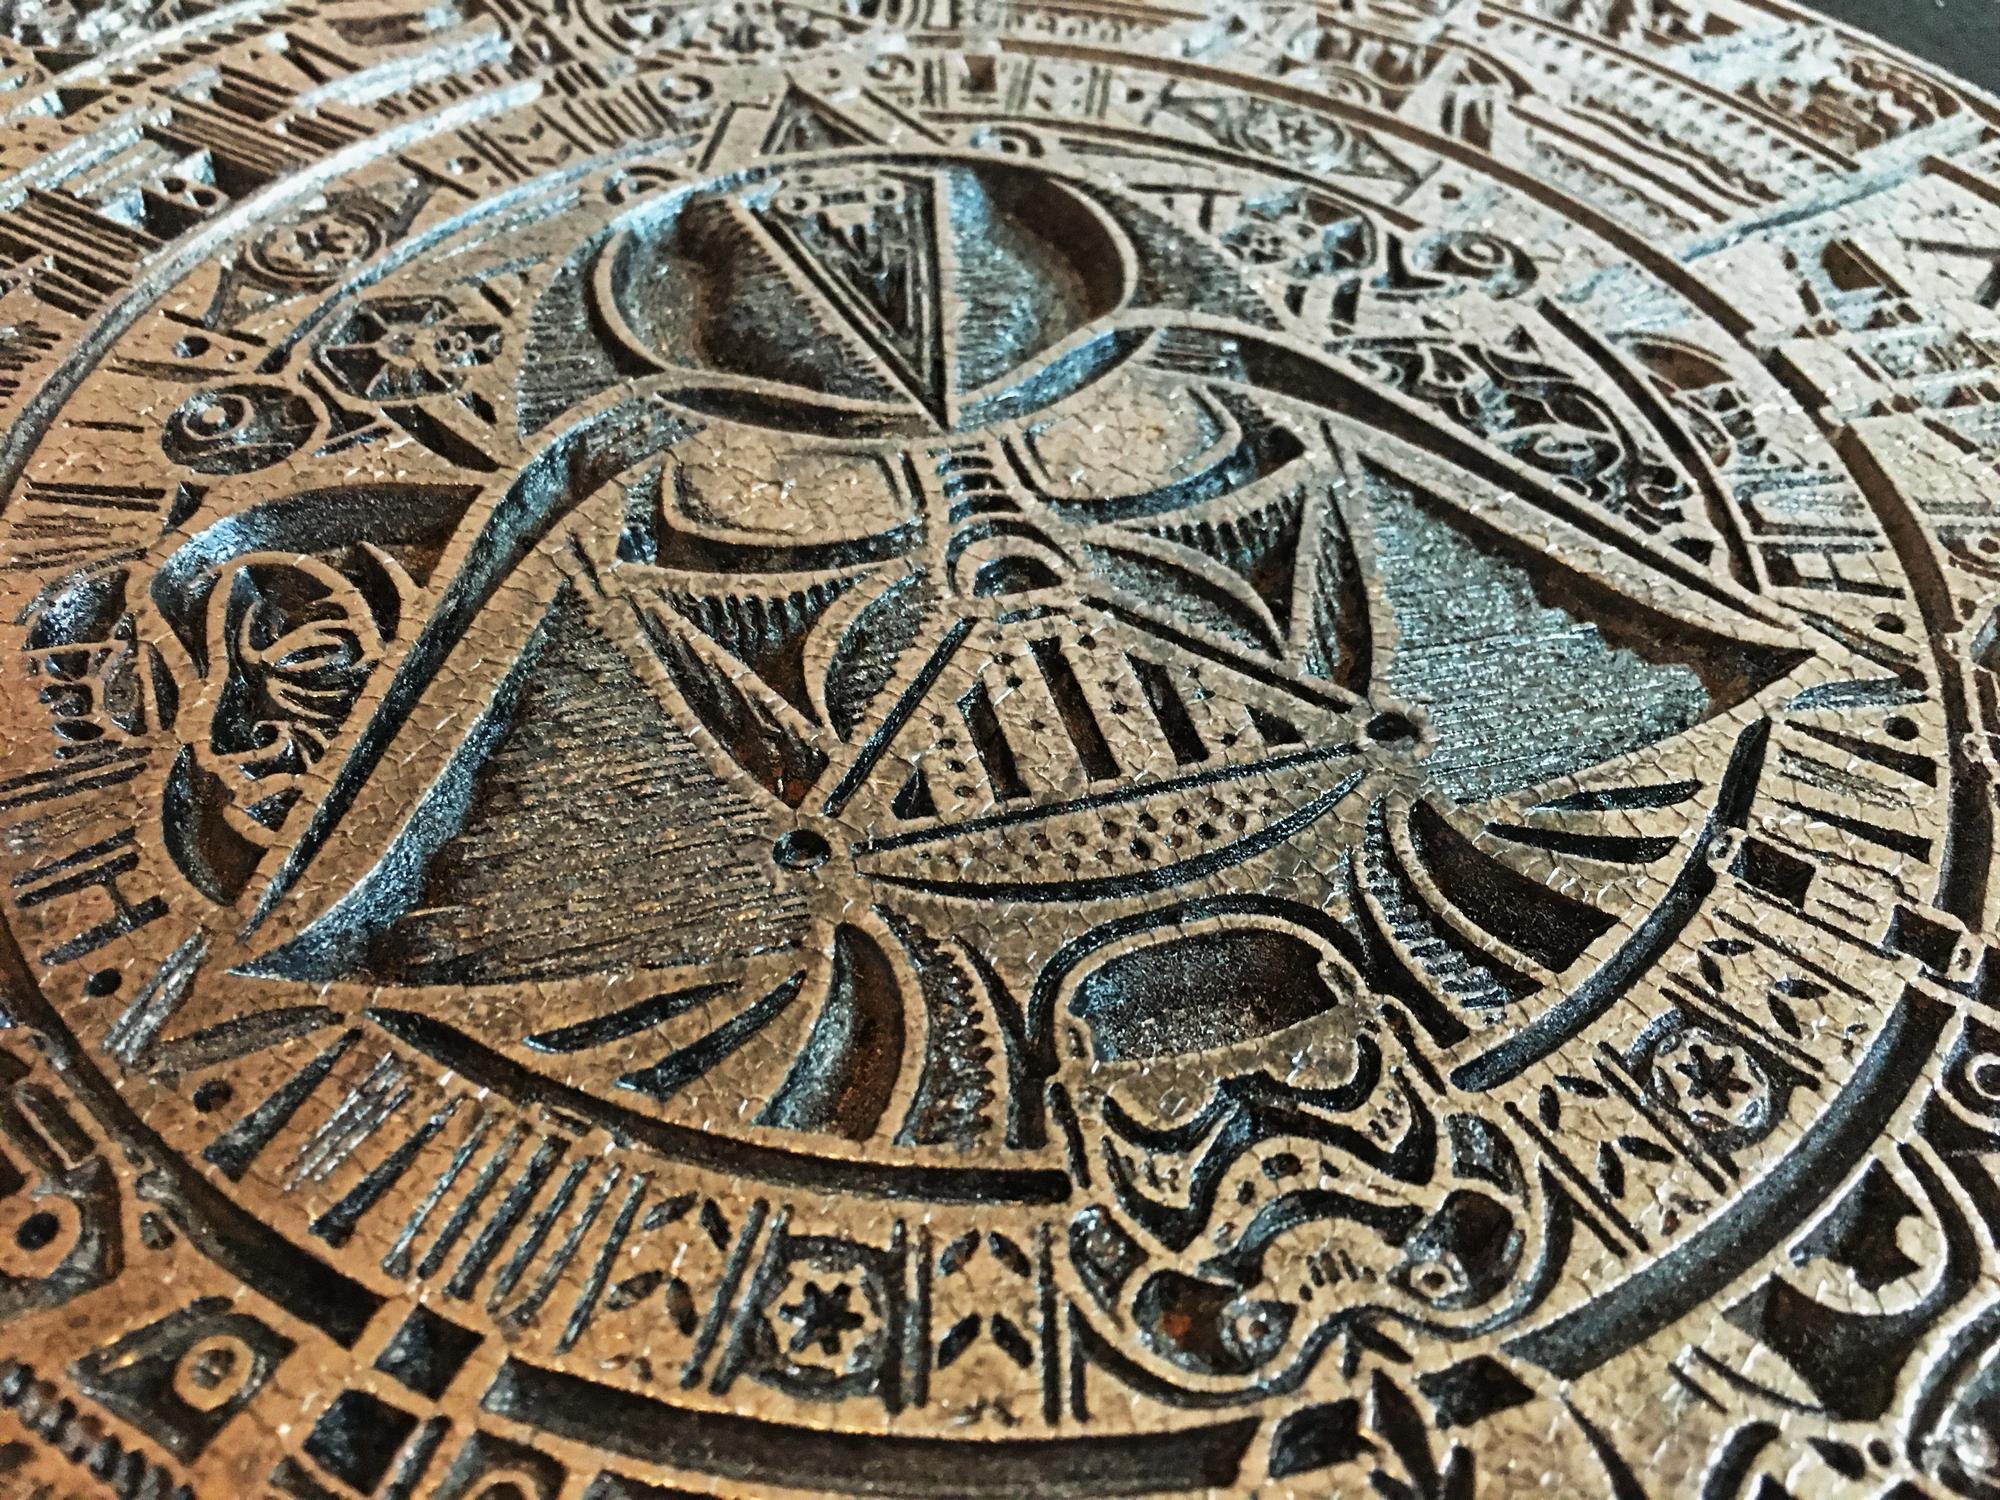 Star Wars Aztec calendar-006-star-wars-aztec-calendar-aged-look-close-up.jpg